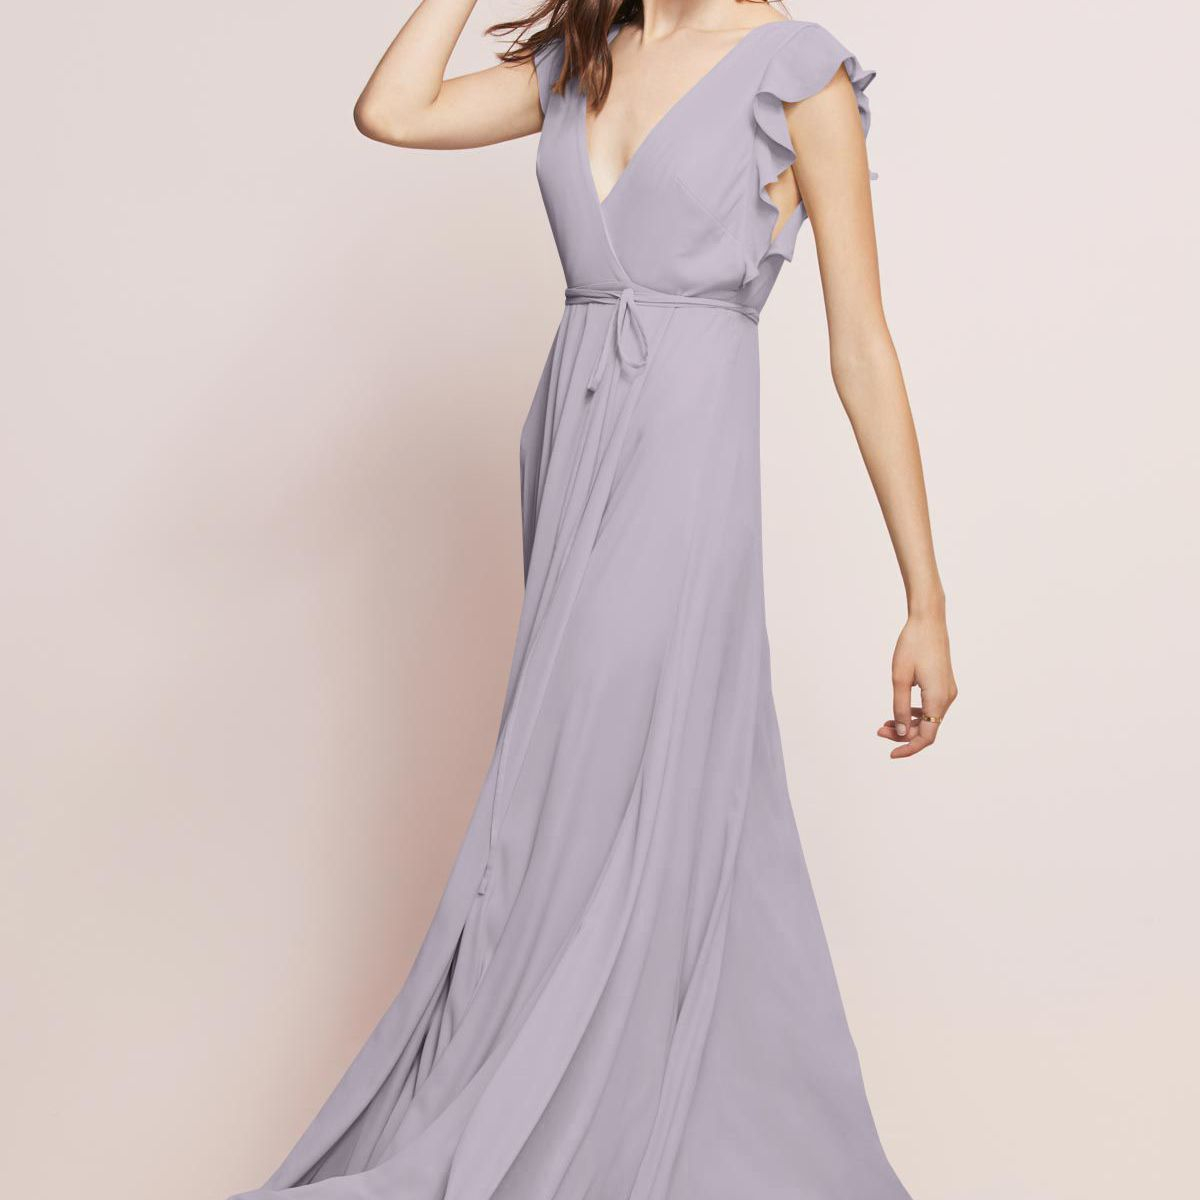 Wtoo Franklin Bridesmaid Dress $255